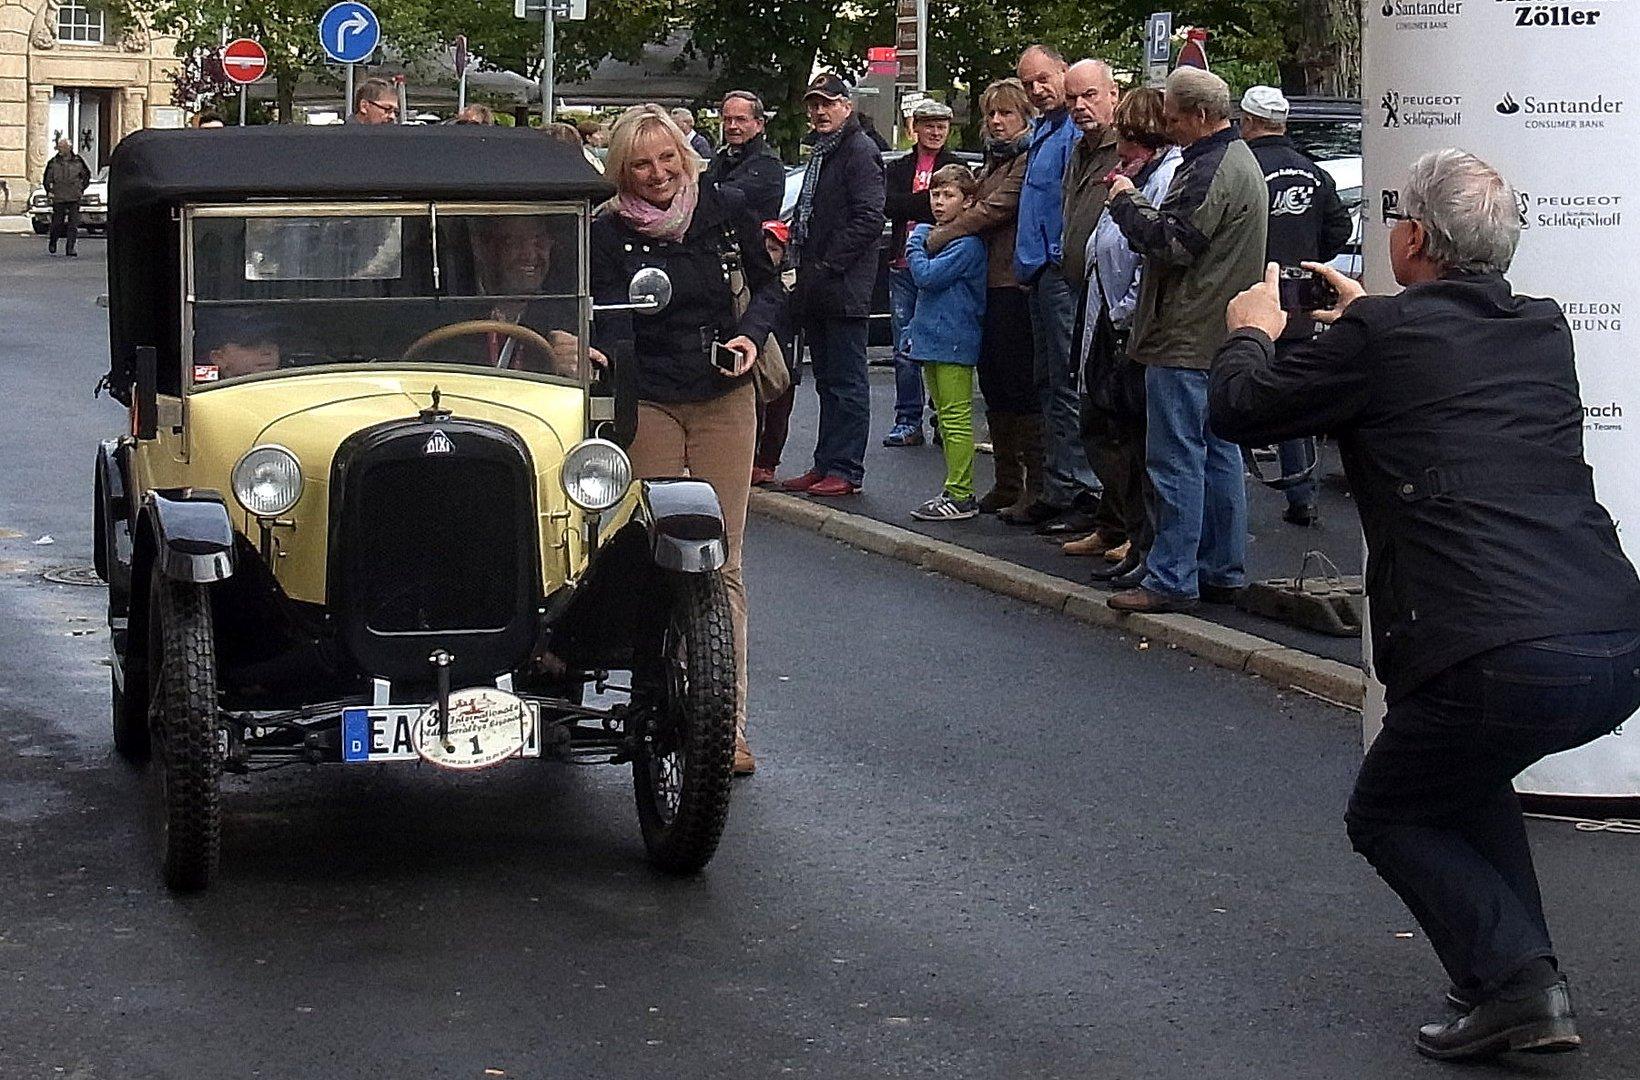 3. Oldtimer-Rallye in Eisenach 2013 - KULTDIXI